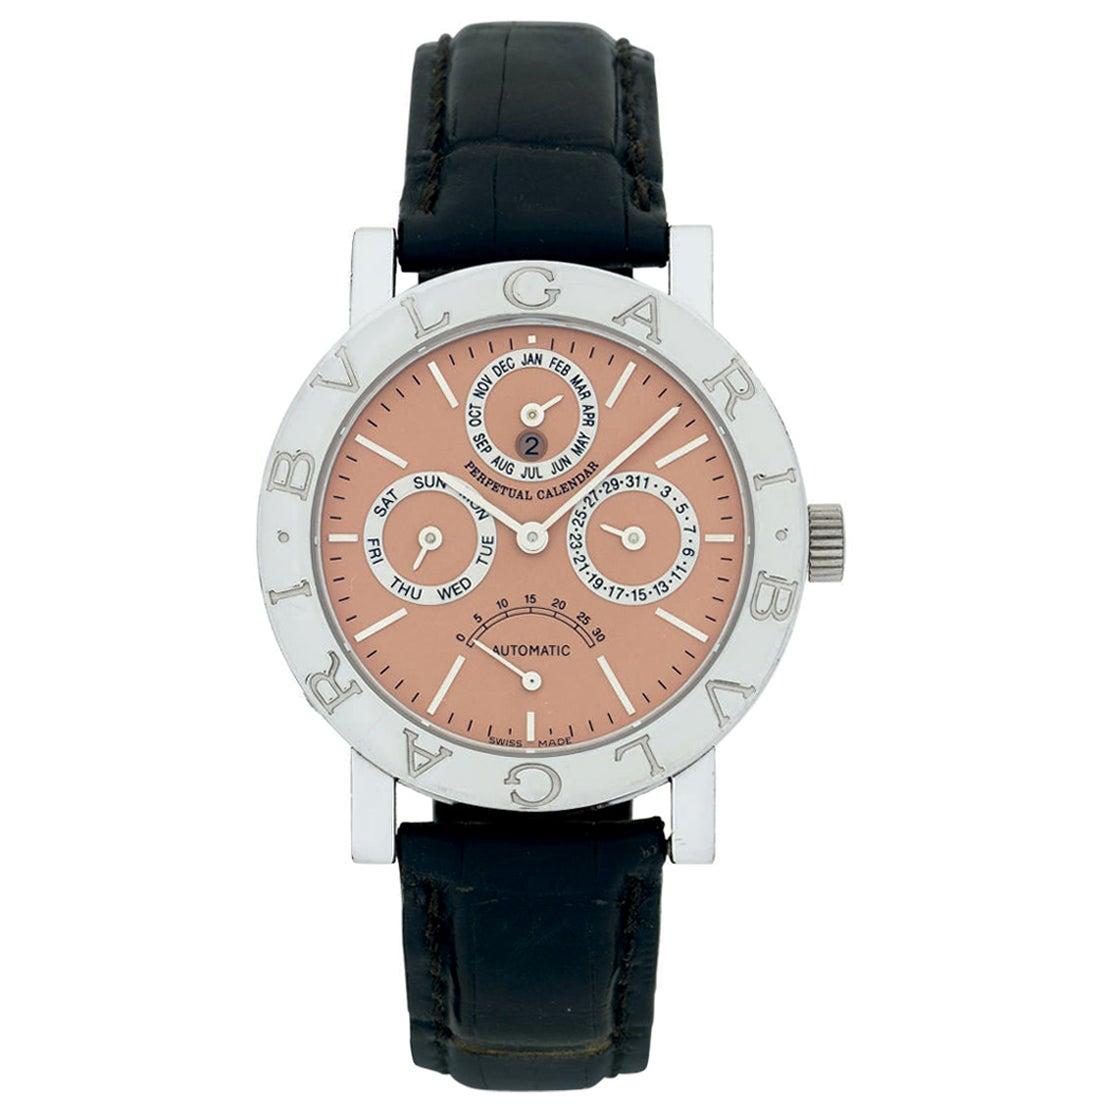 Bulgari Bvlgari Limited Edition Platinum Perpetual Calendar Power Reserve Watch